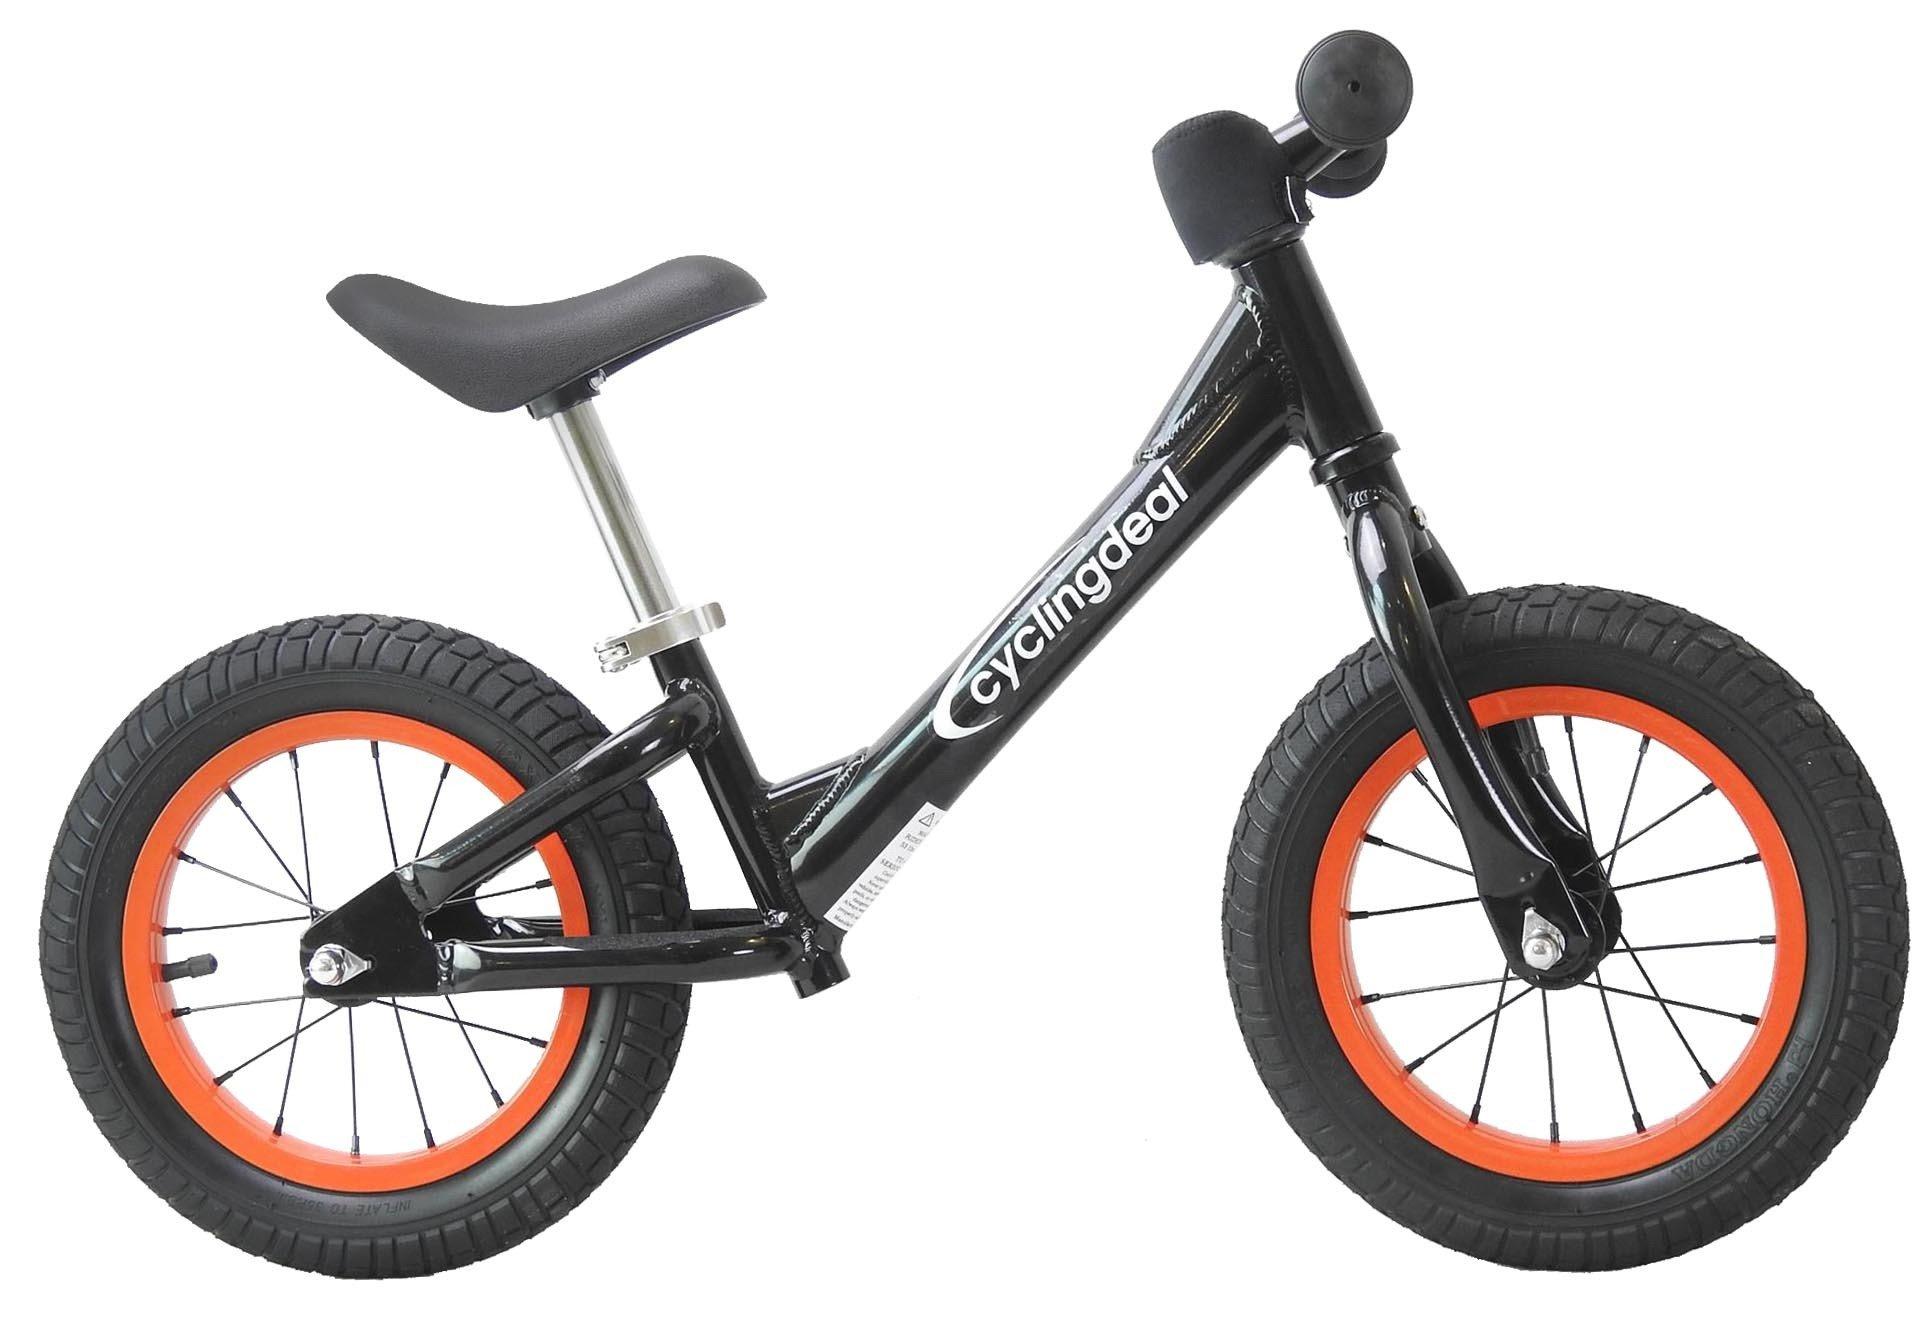 CyclingDeal Alloy Kids Push Balance No-Pedal Bike 12'' Black by CyclingDeal (Image #2)